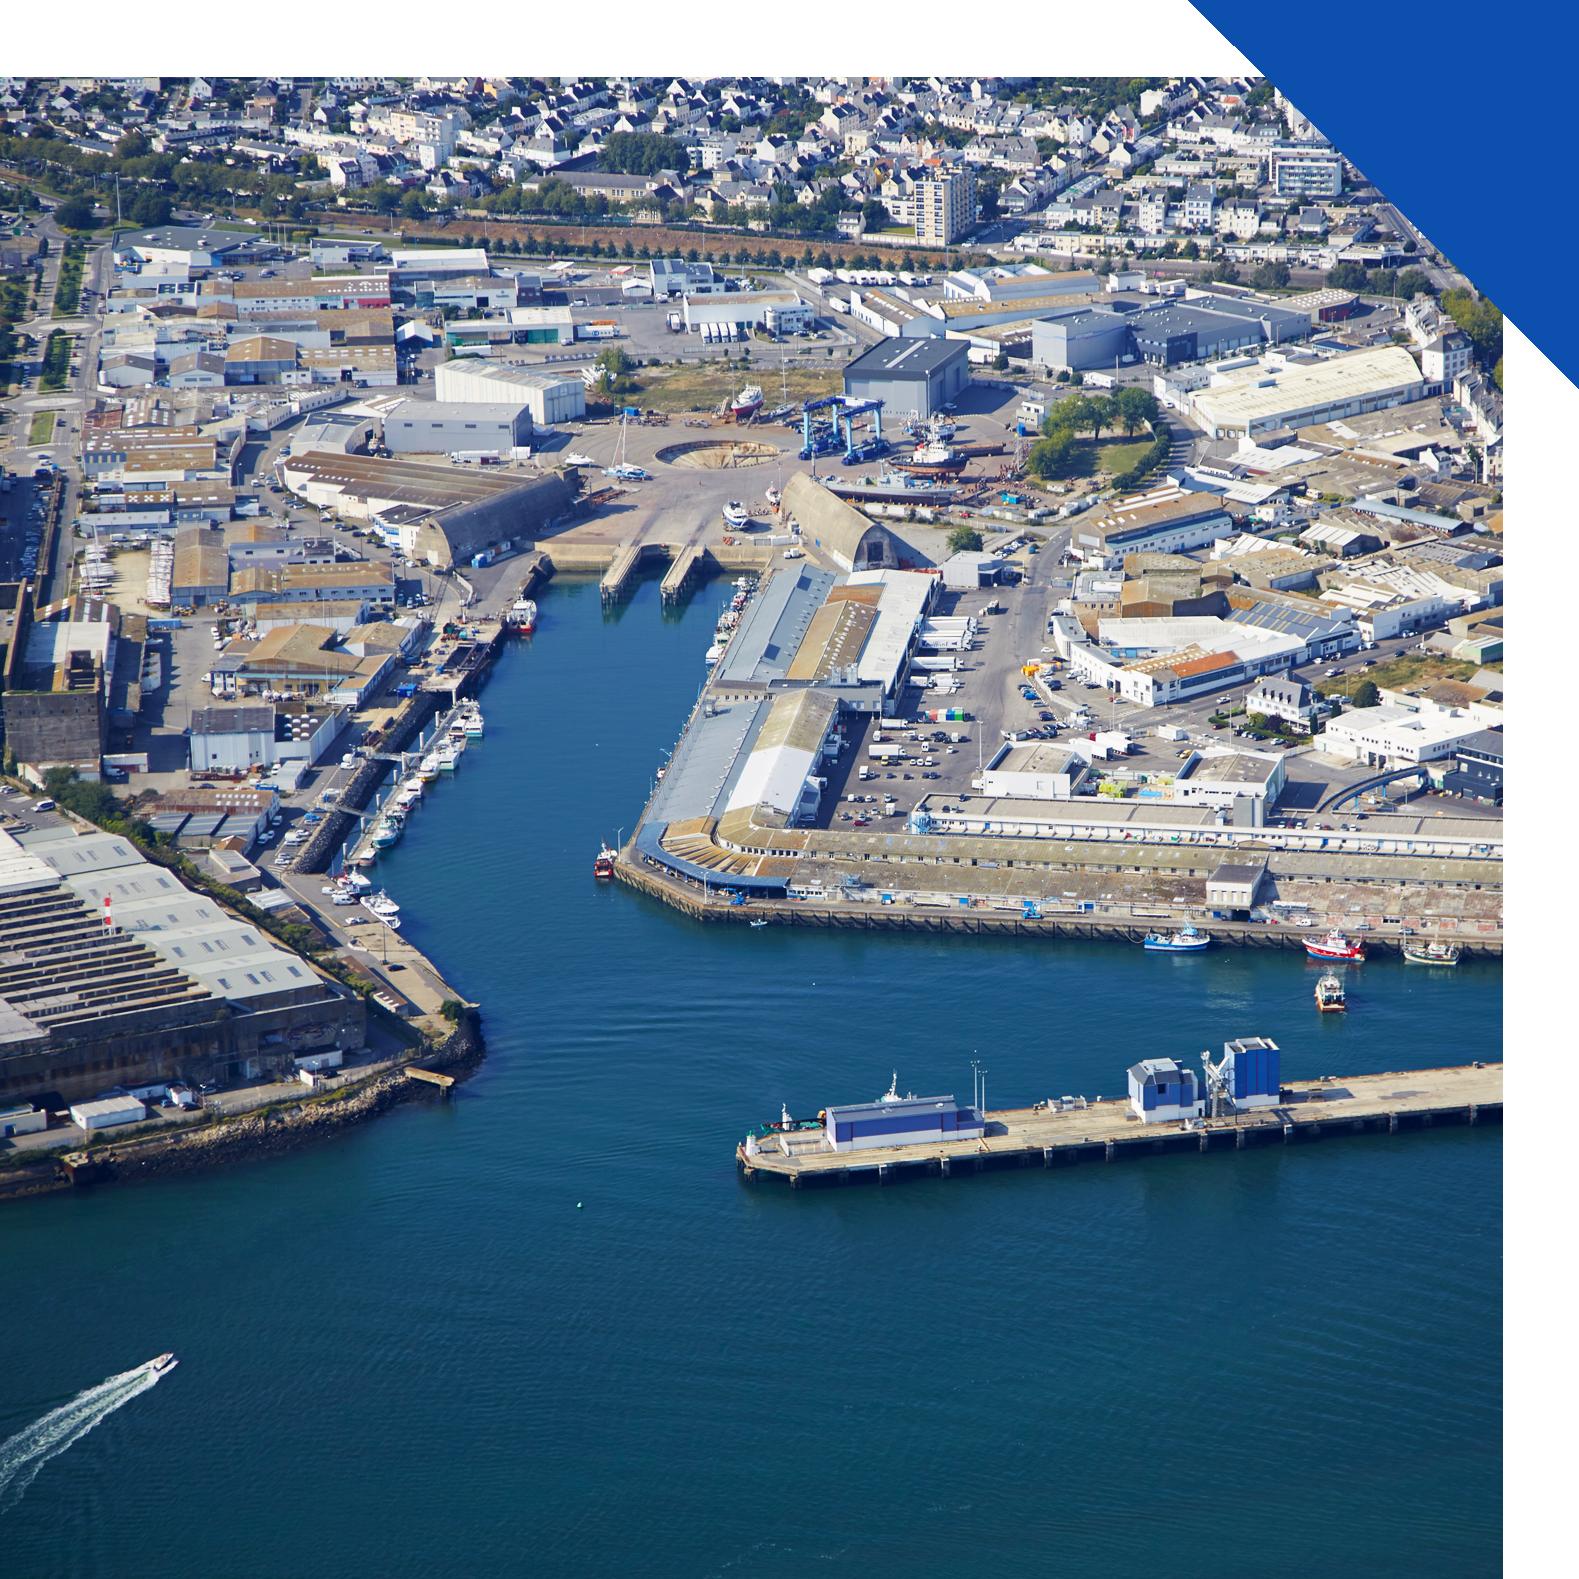 IPL - Interprofession du Port de Lorient